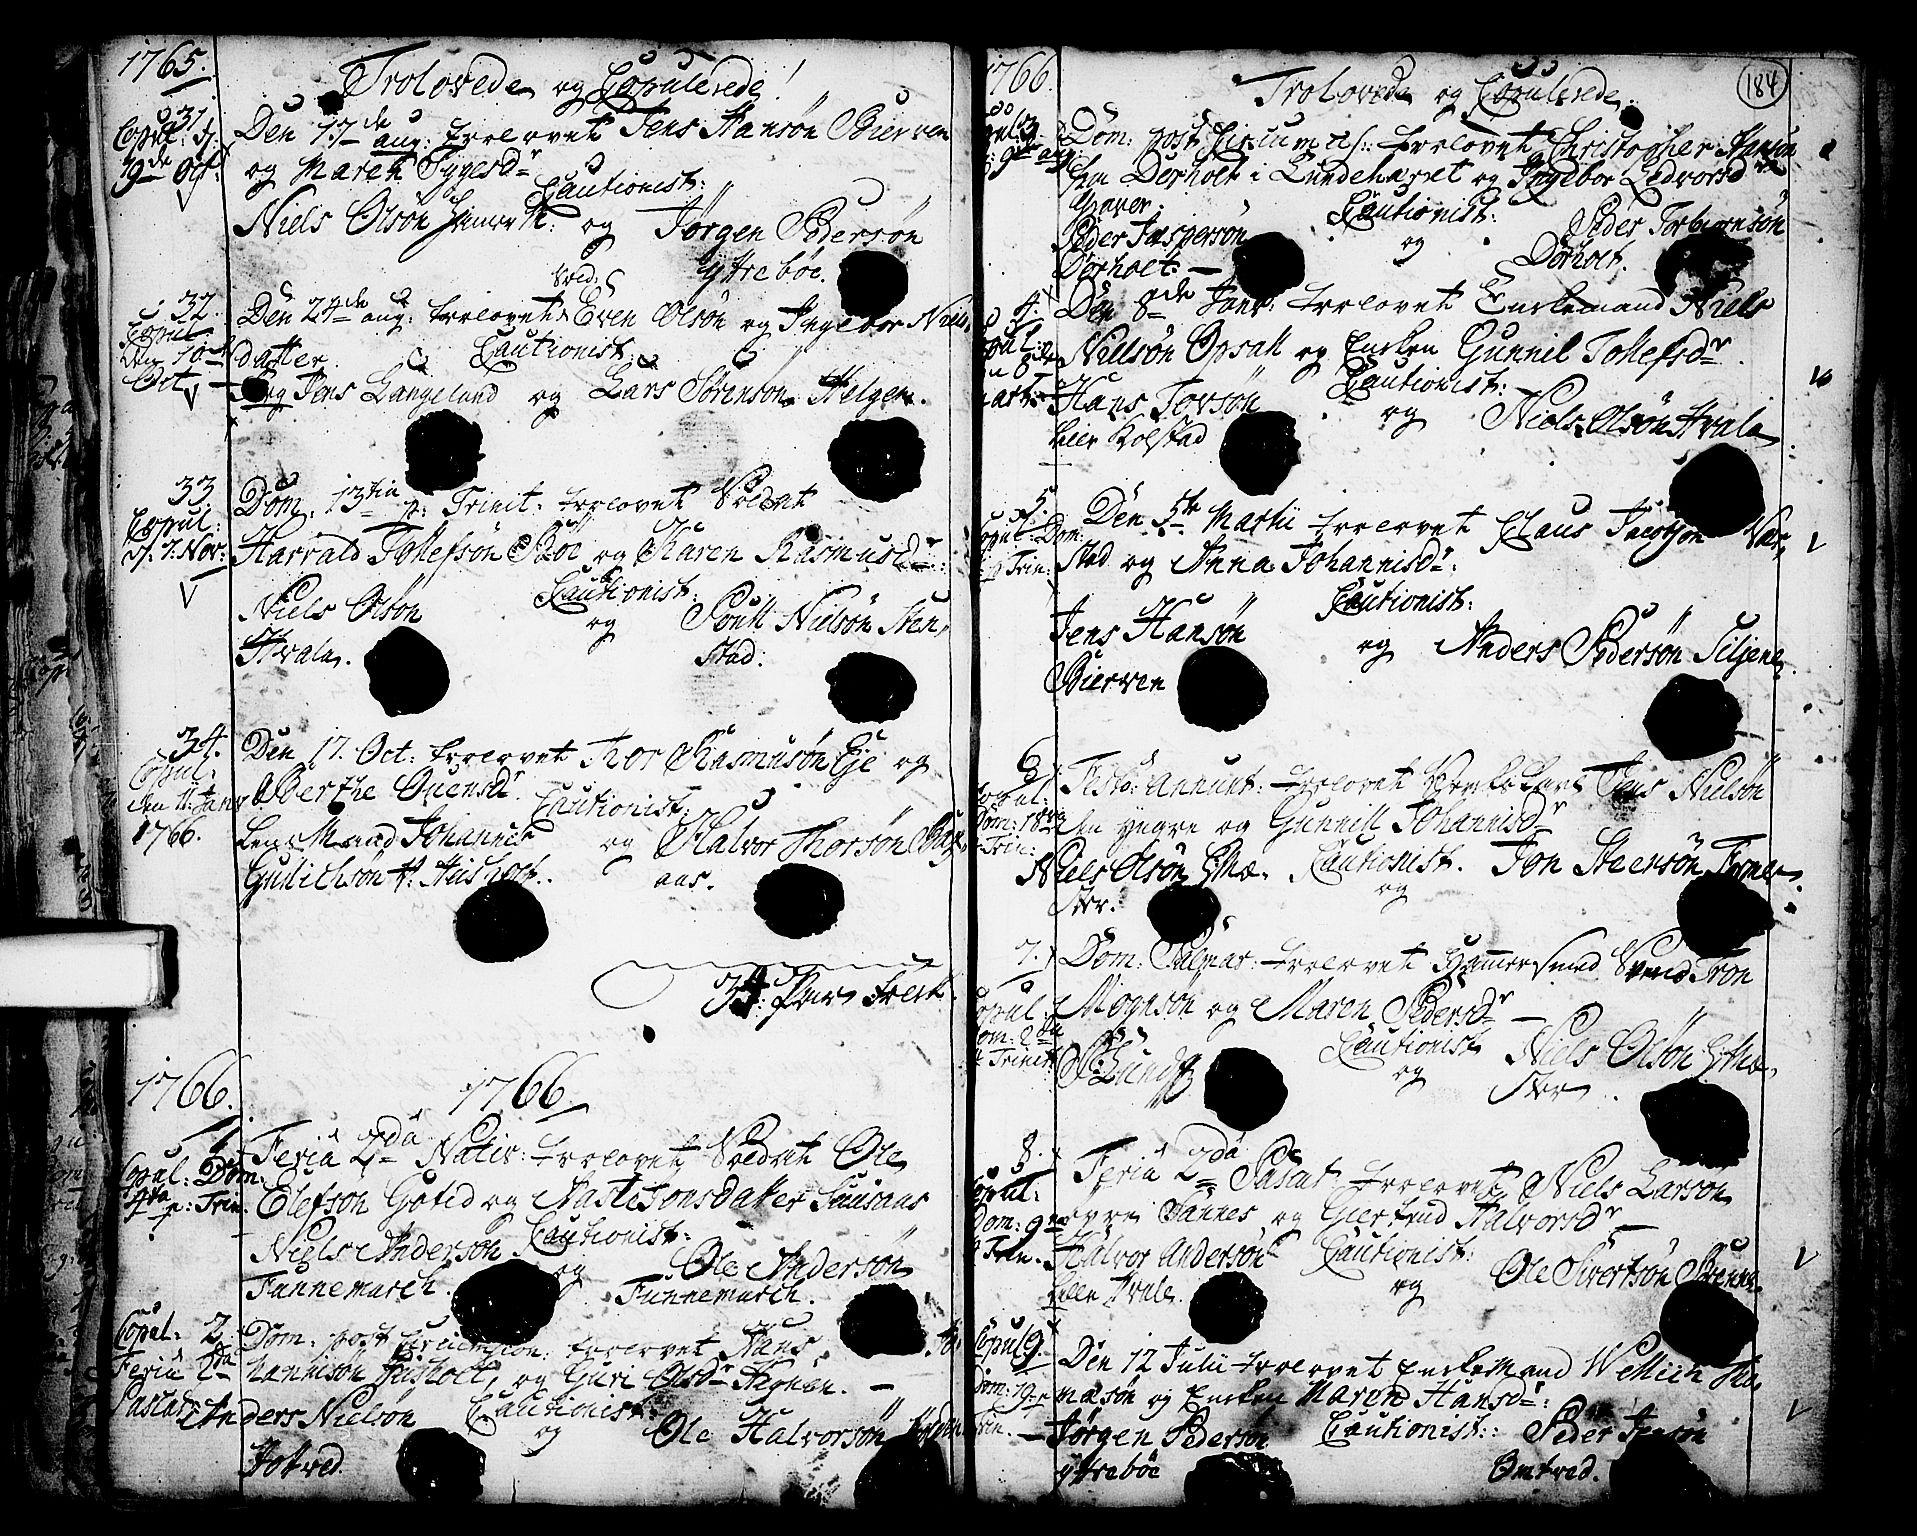 SAKO, Holla kirkebøker, F/Fa/L0001: Ministerialbok nr. 1, 1717-1779, s. 184